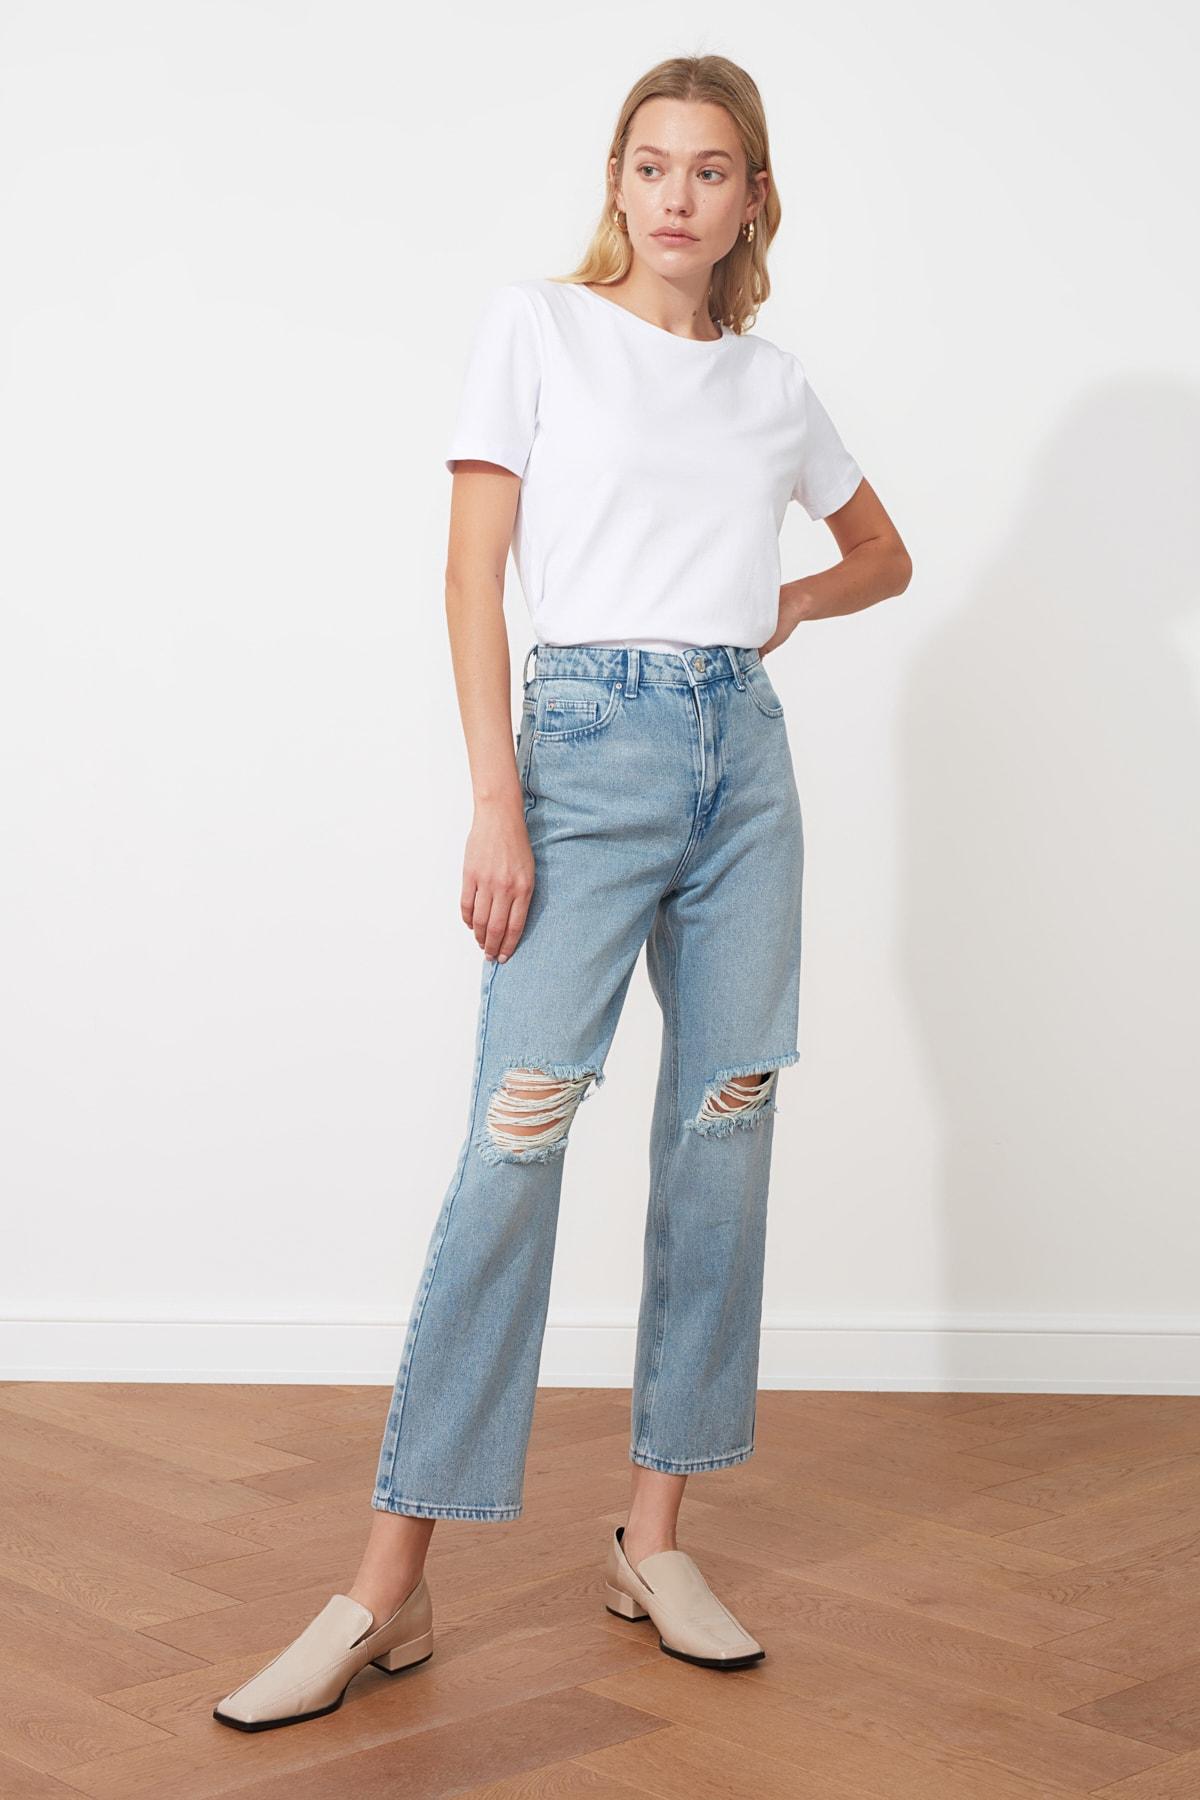 TRENDYOLMİLLA Mavi Yırtık Detaylı Yüksek Bel Straight Jeans TWOAW21JE0120 1